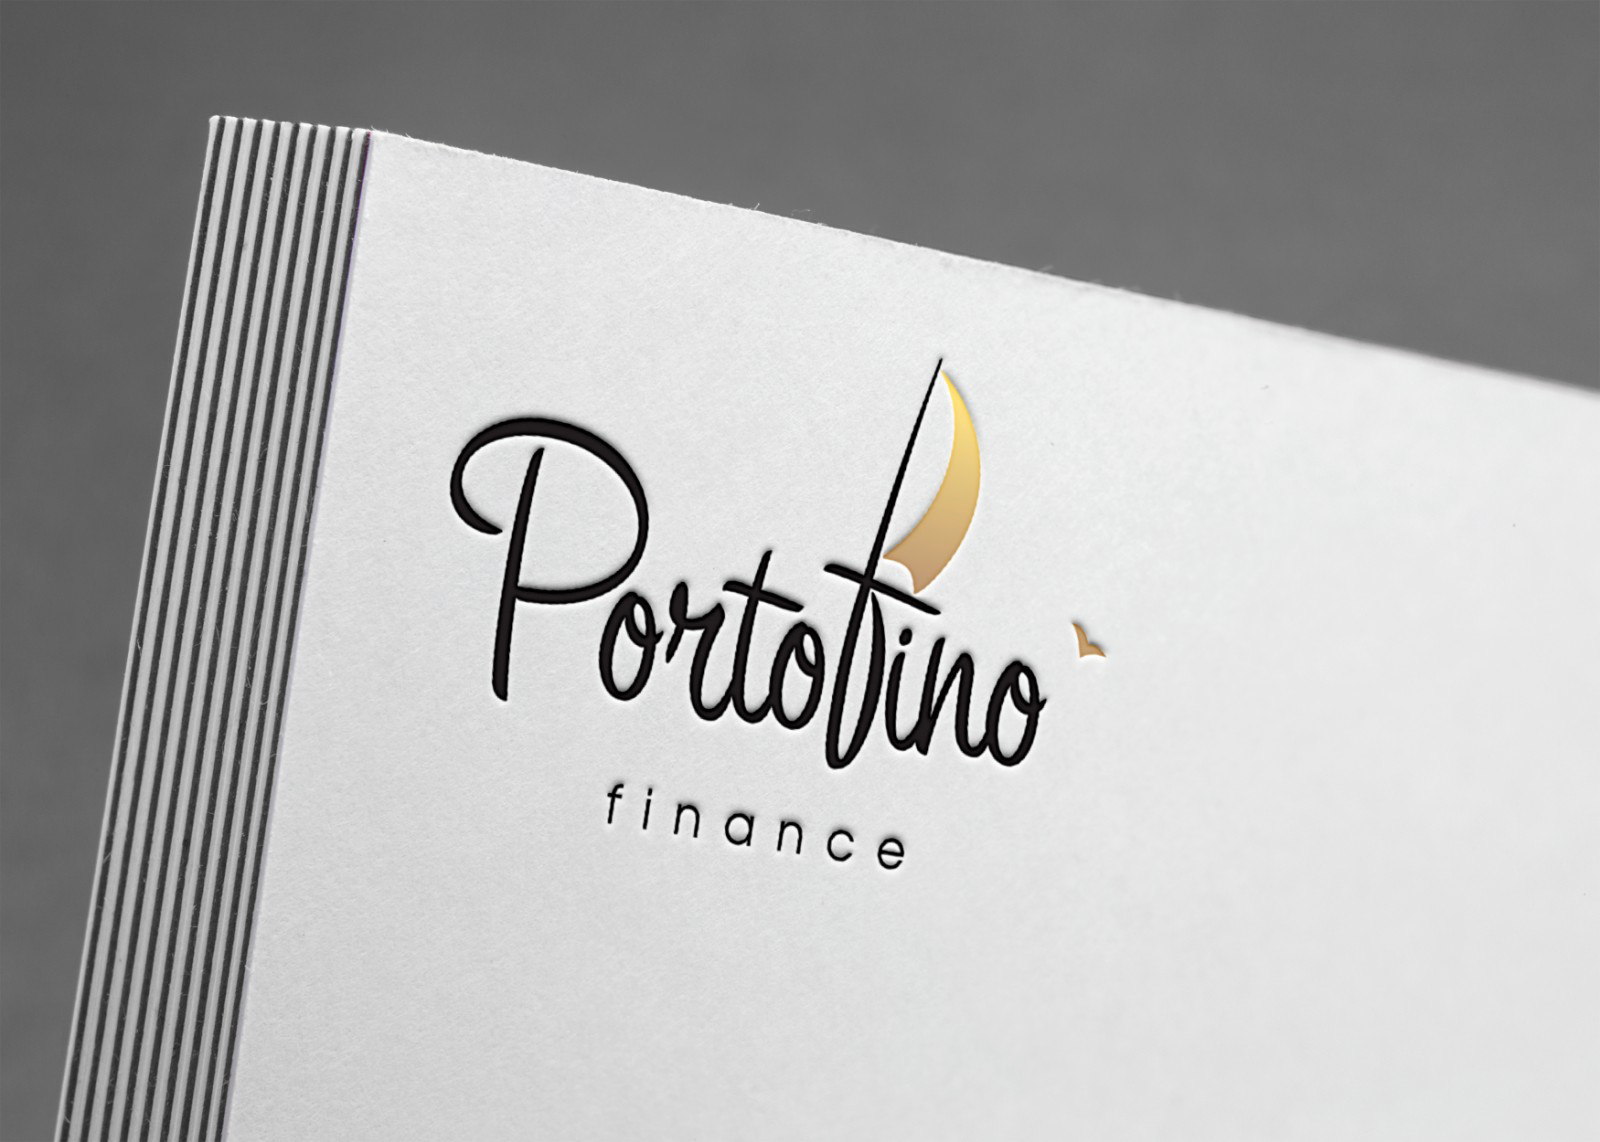 Создание логотипа для Portafino